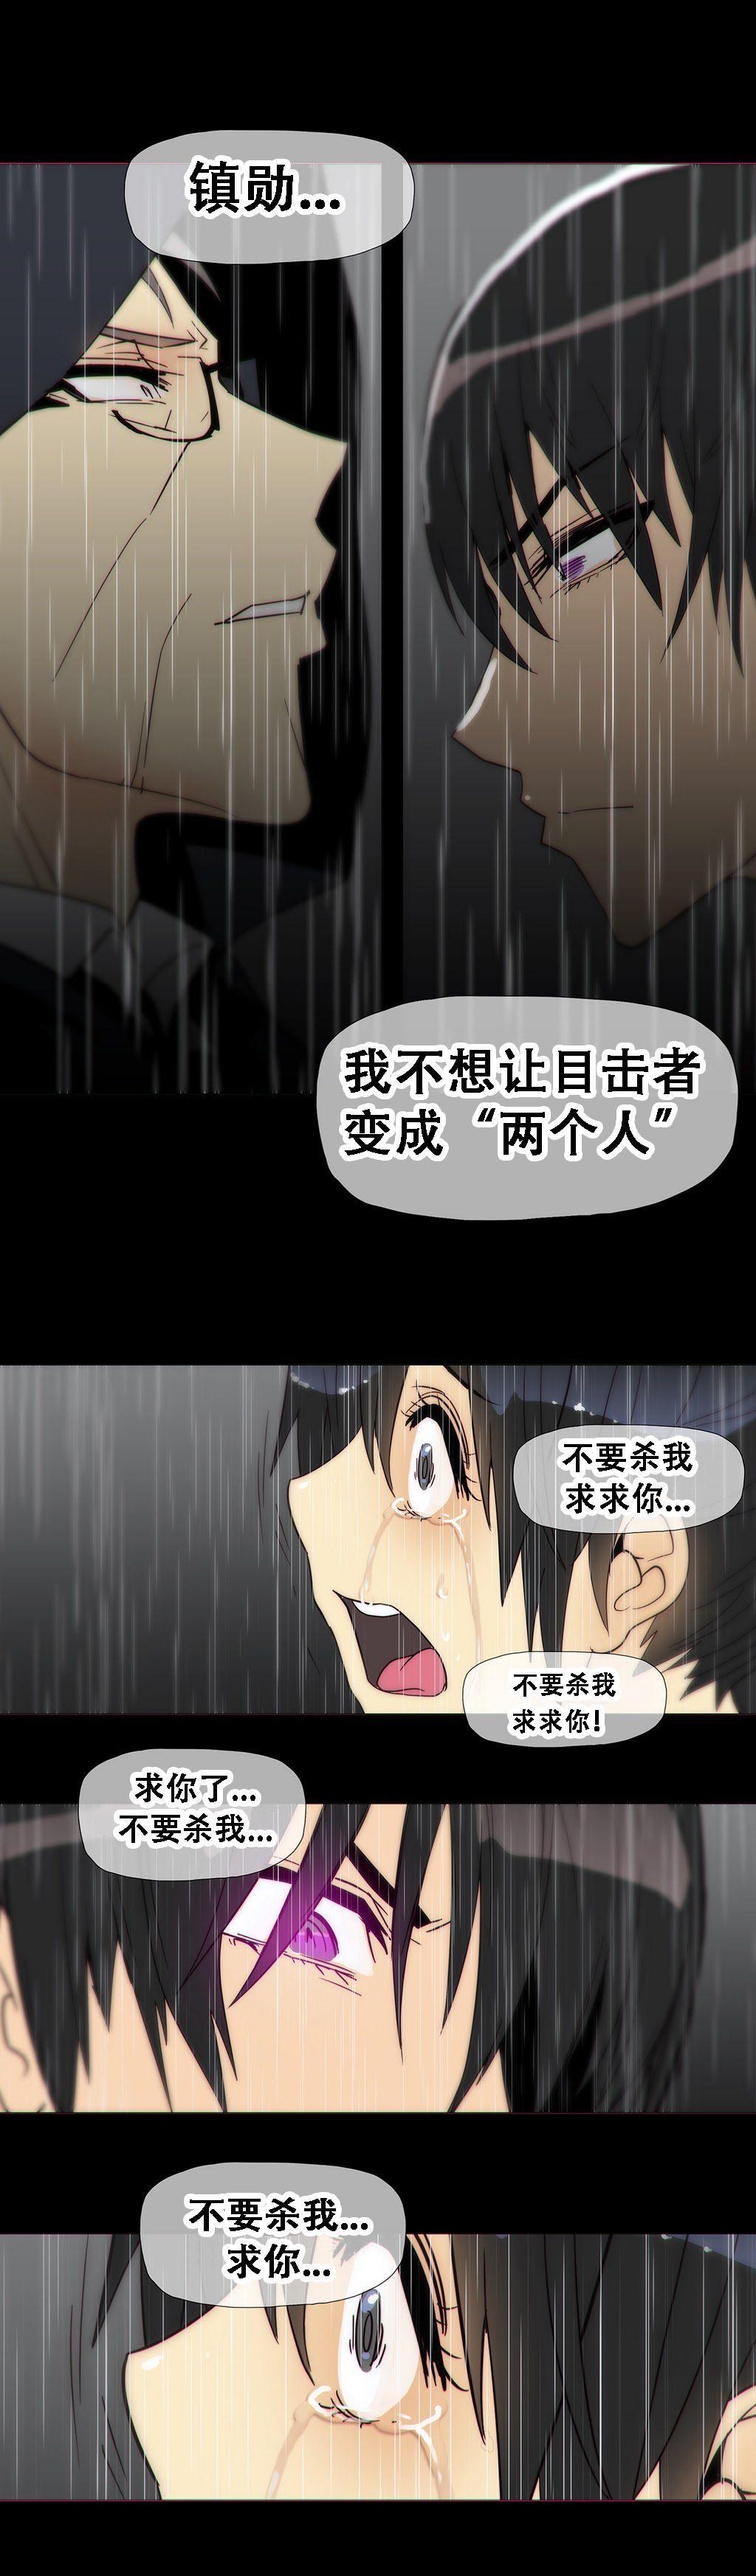 HouseHold Affairs 【卞赤鲤个人汉化】1~33话(持续更新中) 336